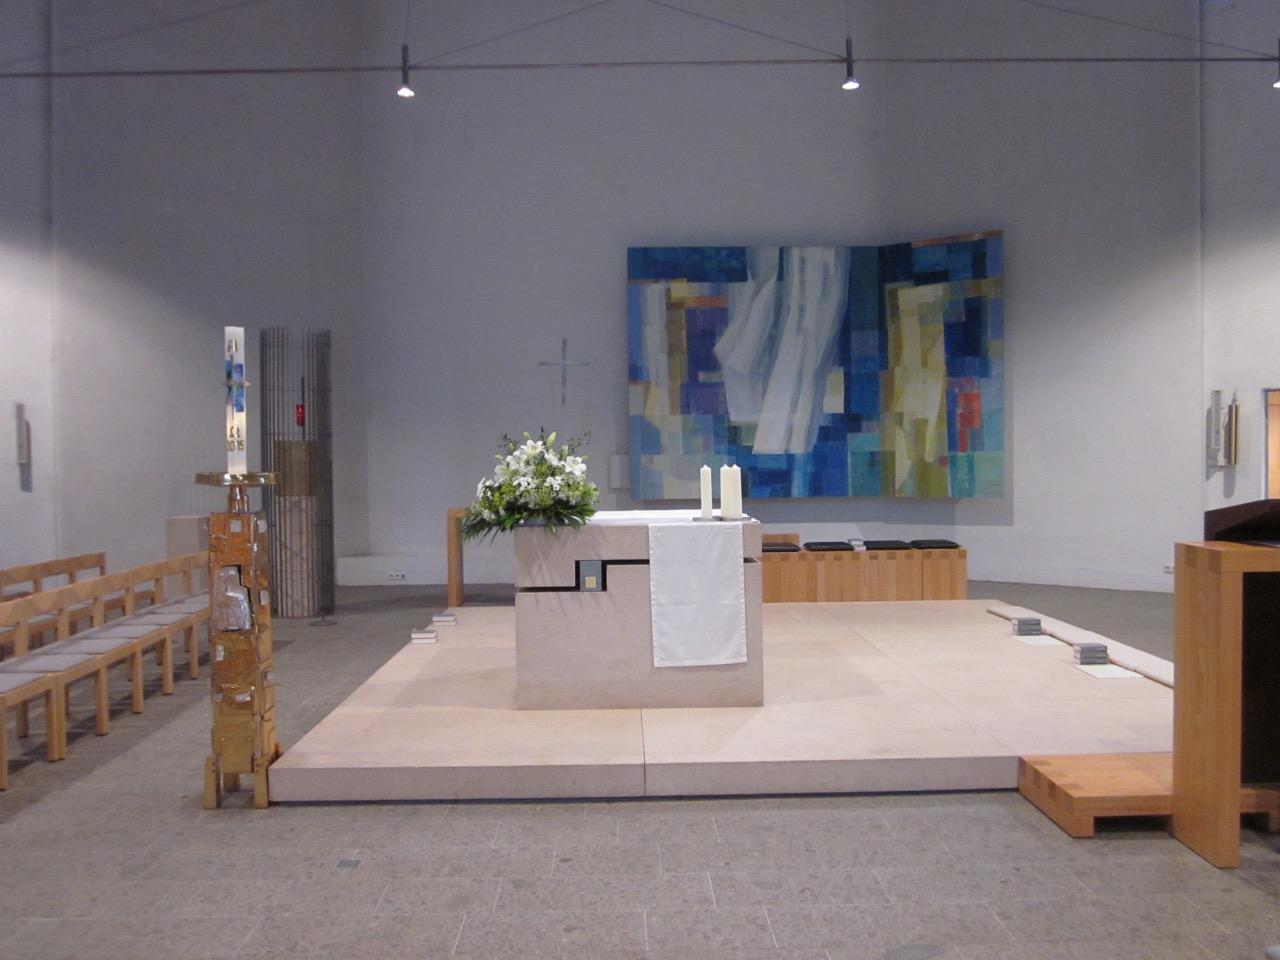 Altarraum mit Meditationsbild (K.-P. Blau, 1999)